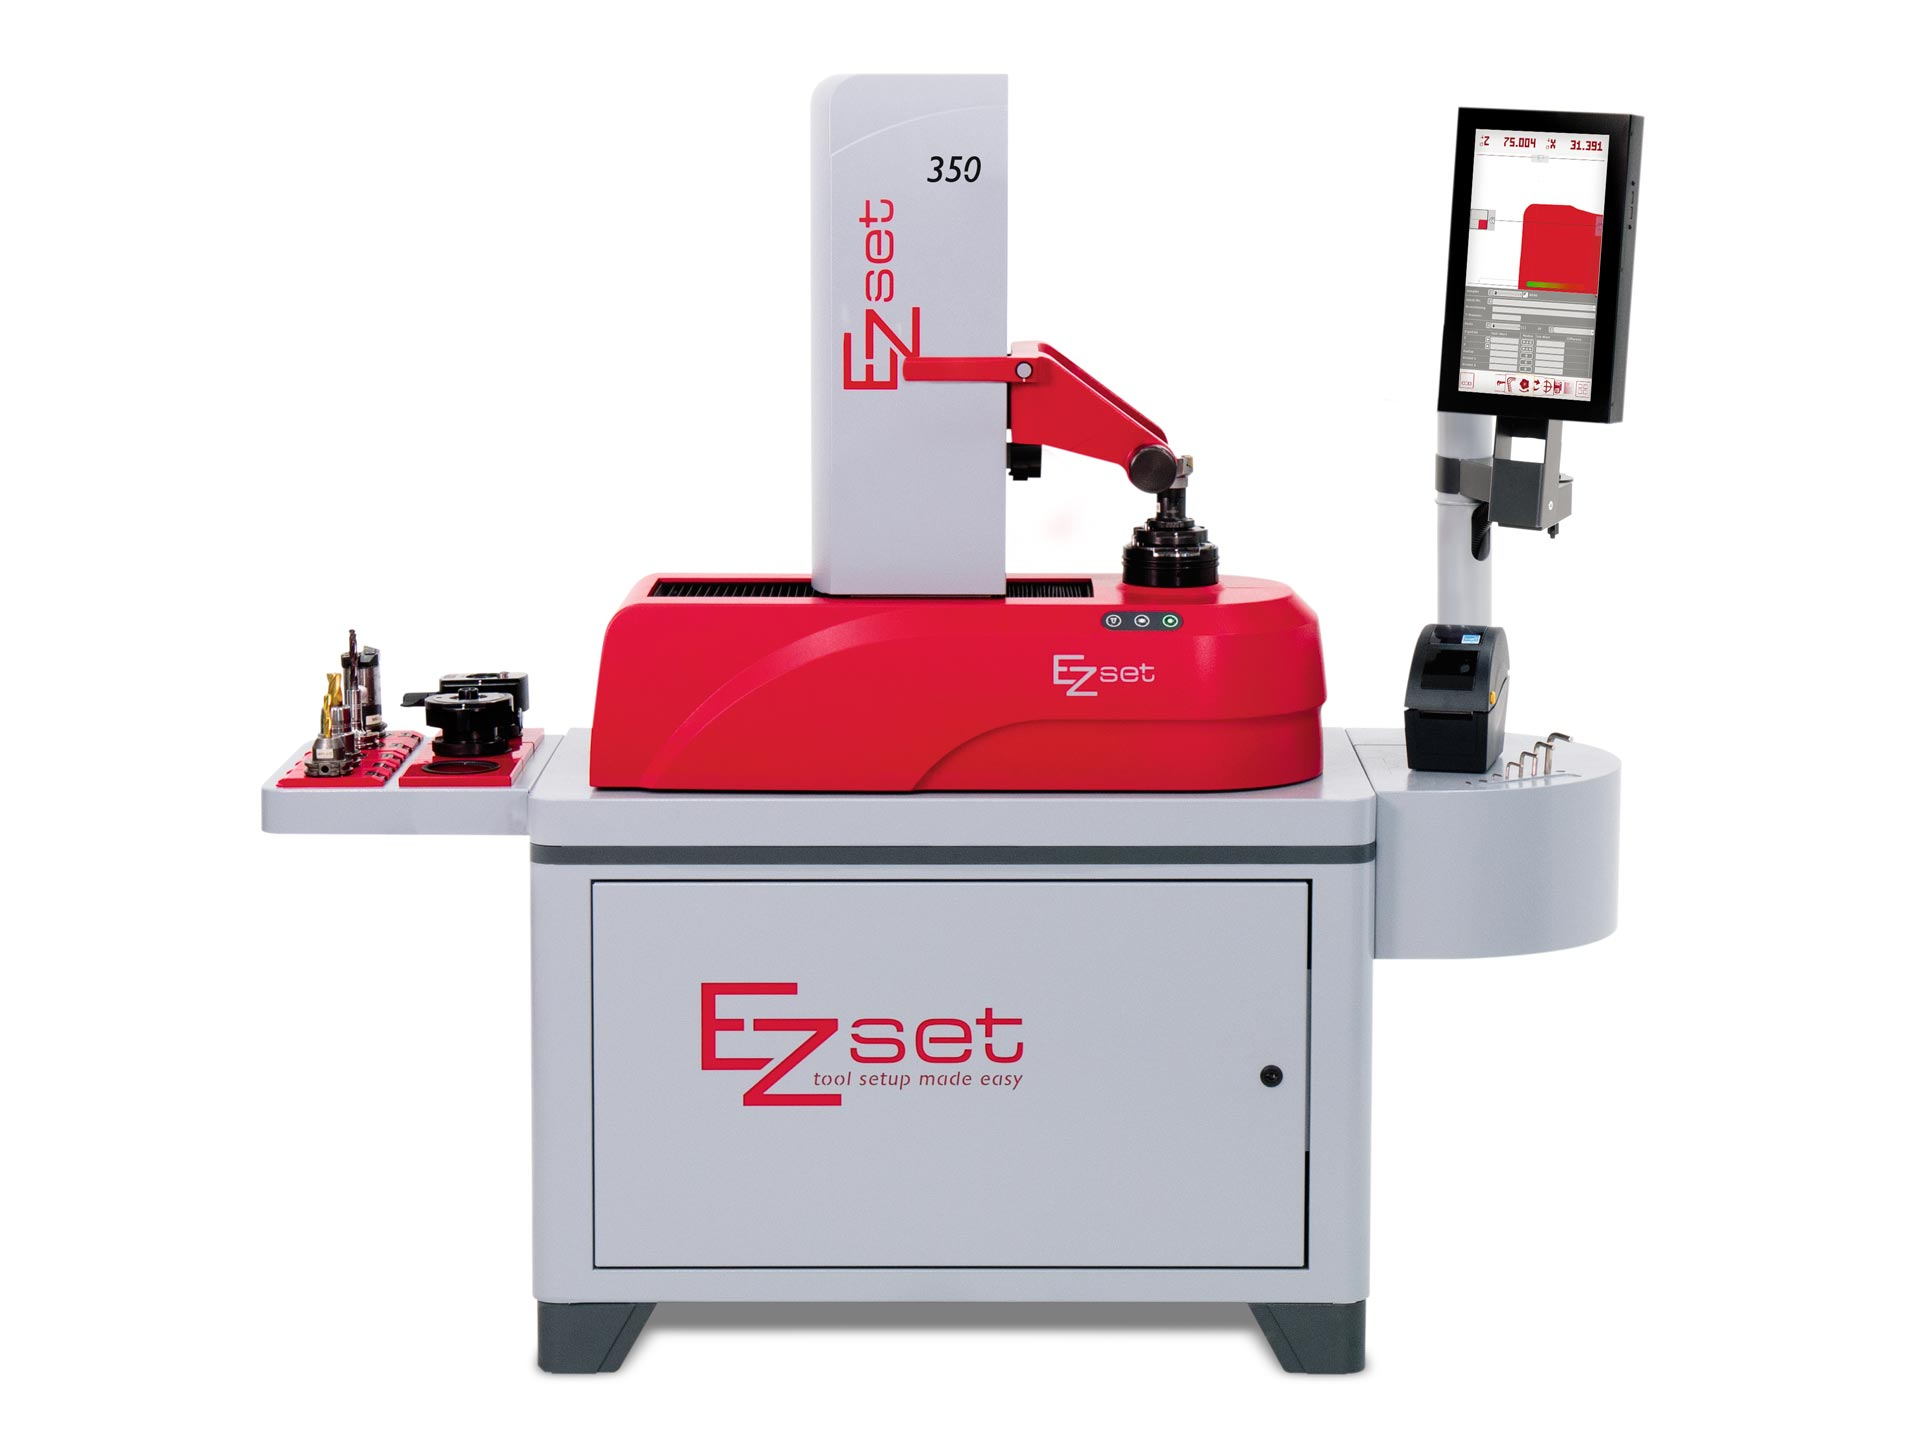 Spinner AG - EZset 350 mit ImageController1